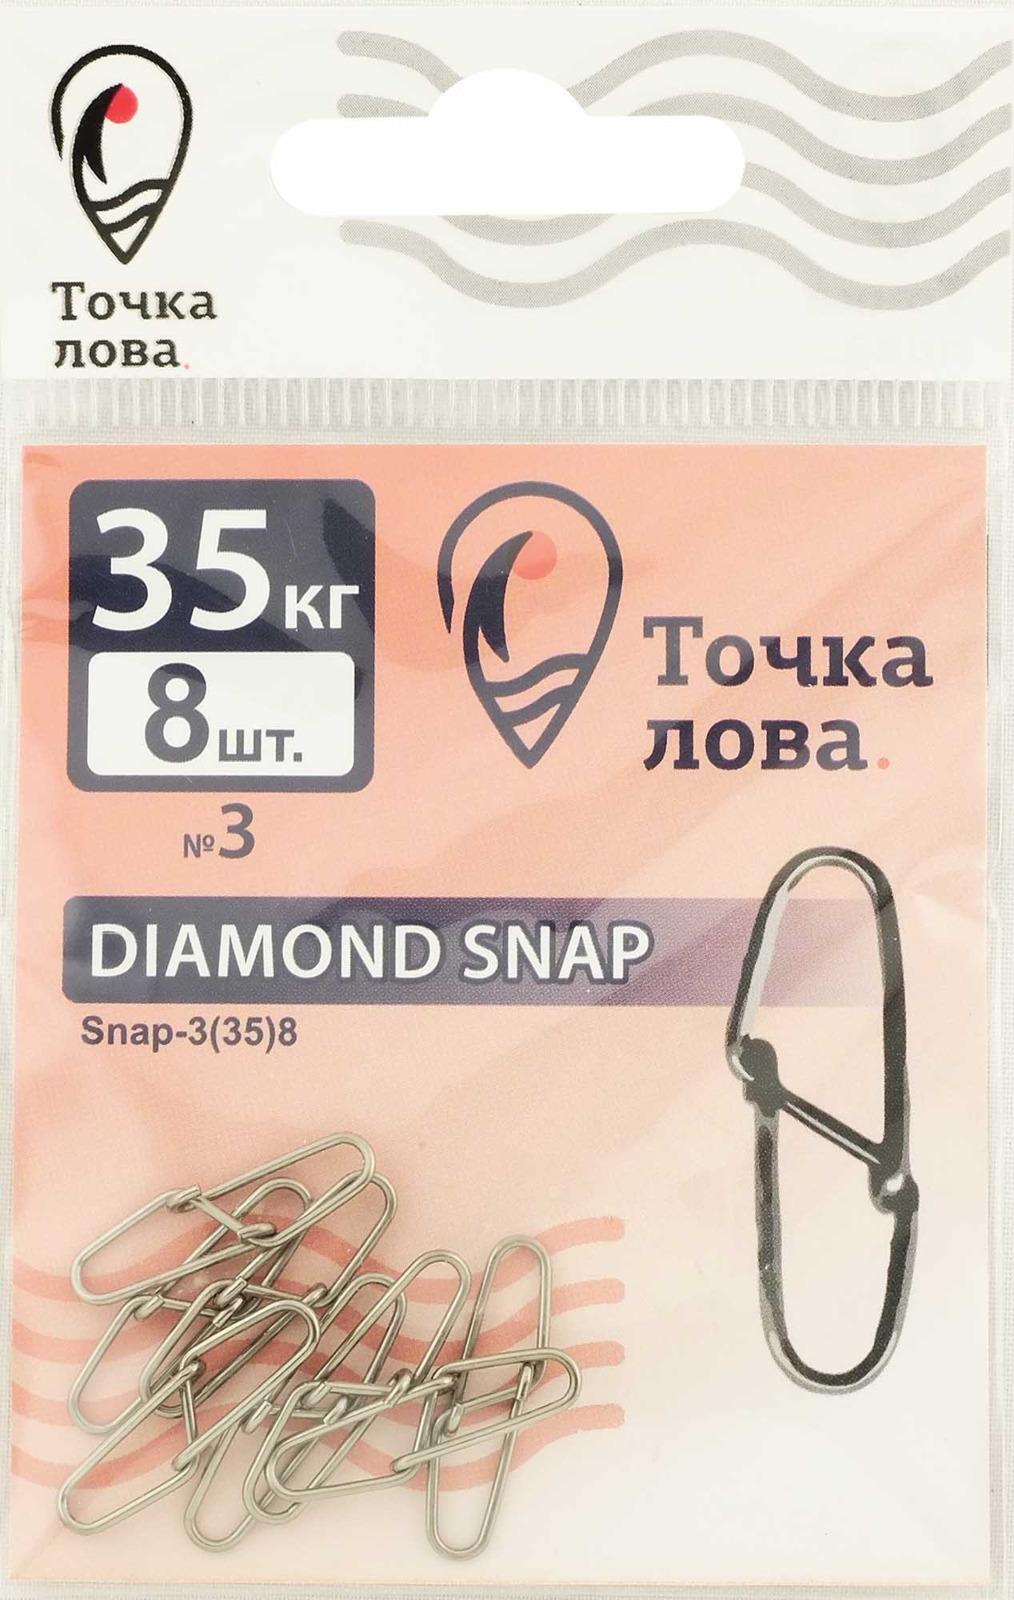 Аксессуар для рыбалки Точка Лова Застежка, Snap-3(35), 8 шт